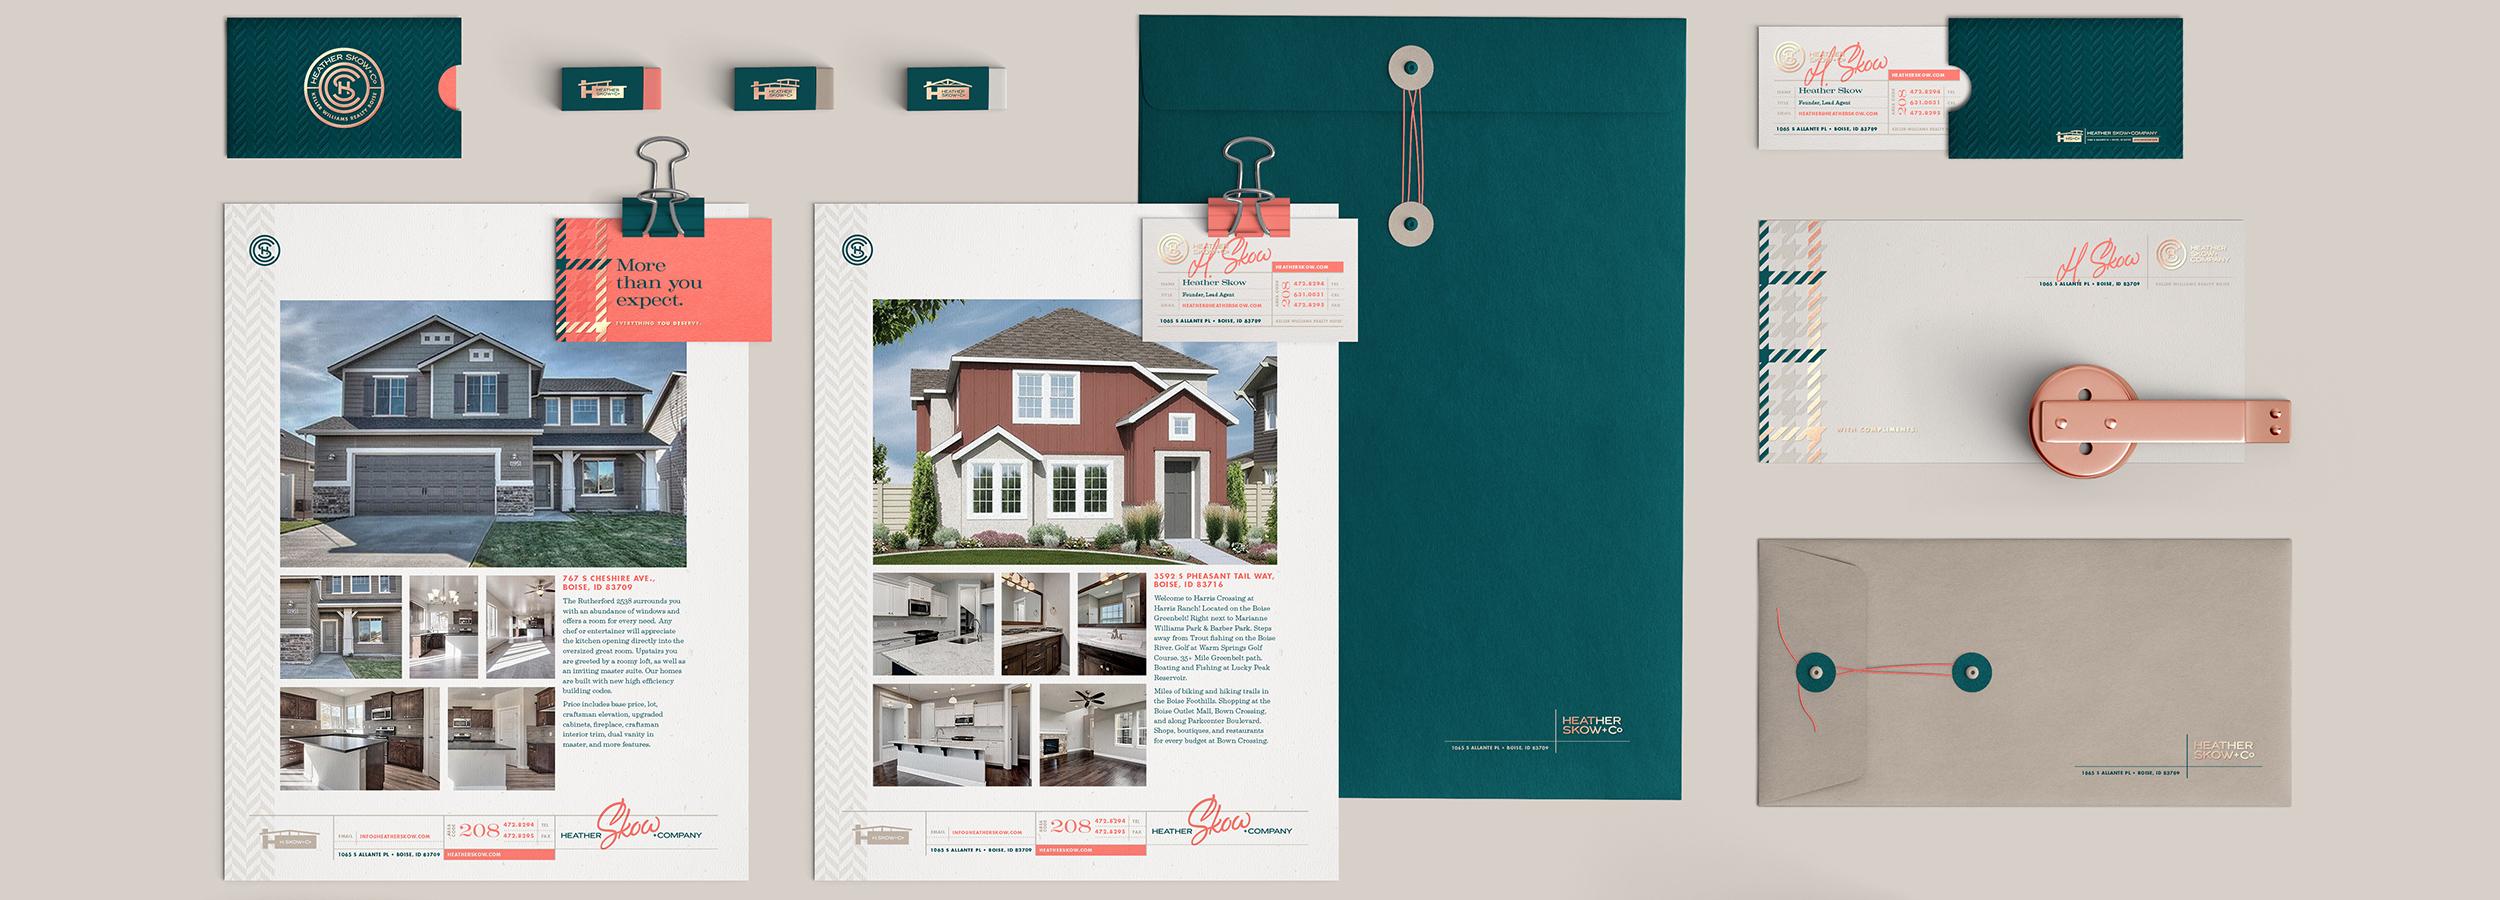 Heather Skow + Co. – Real estate brokerage branding